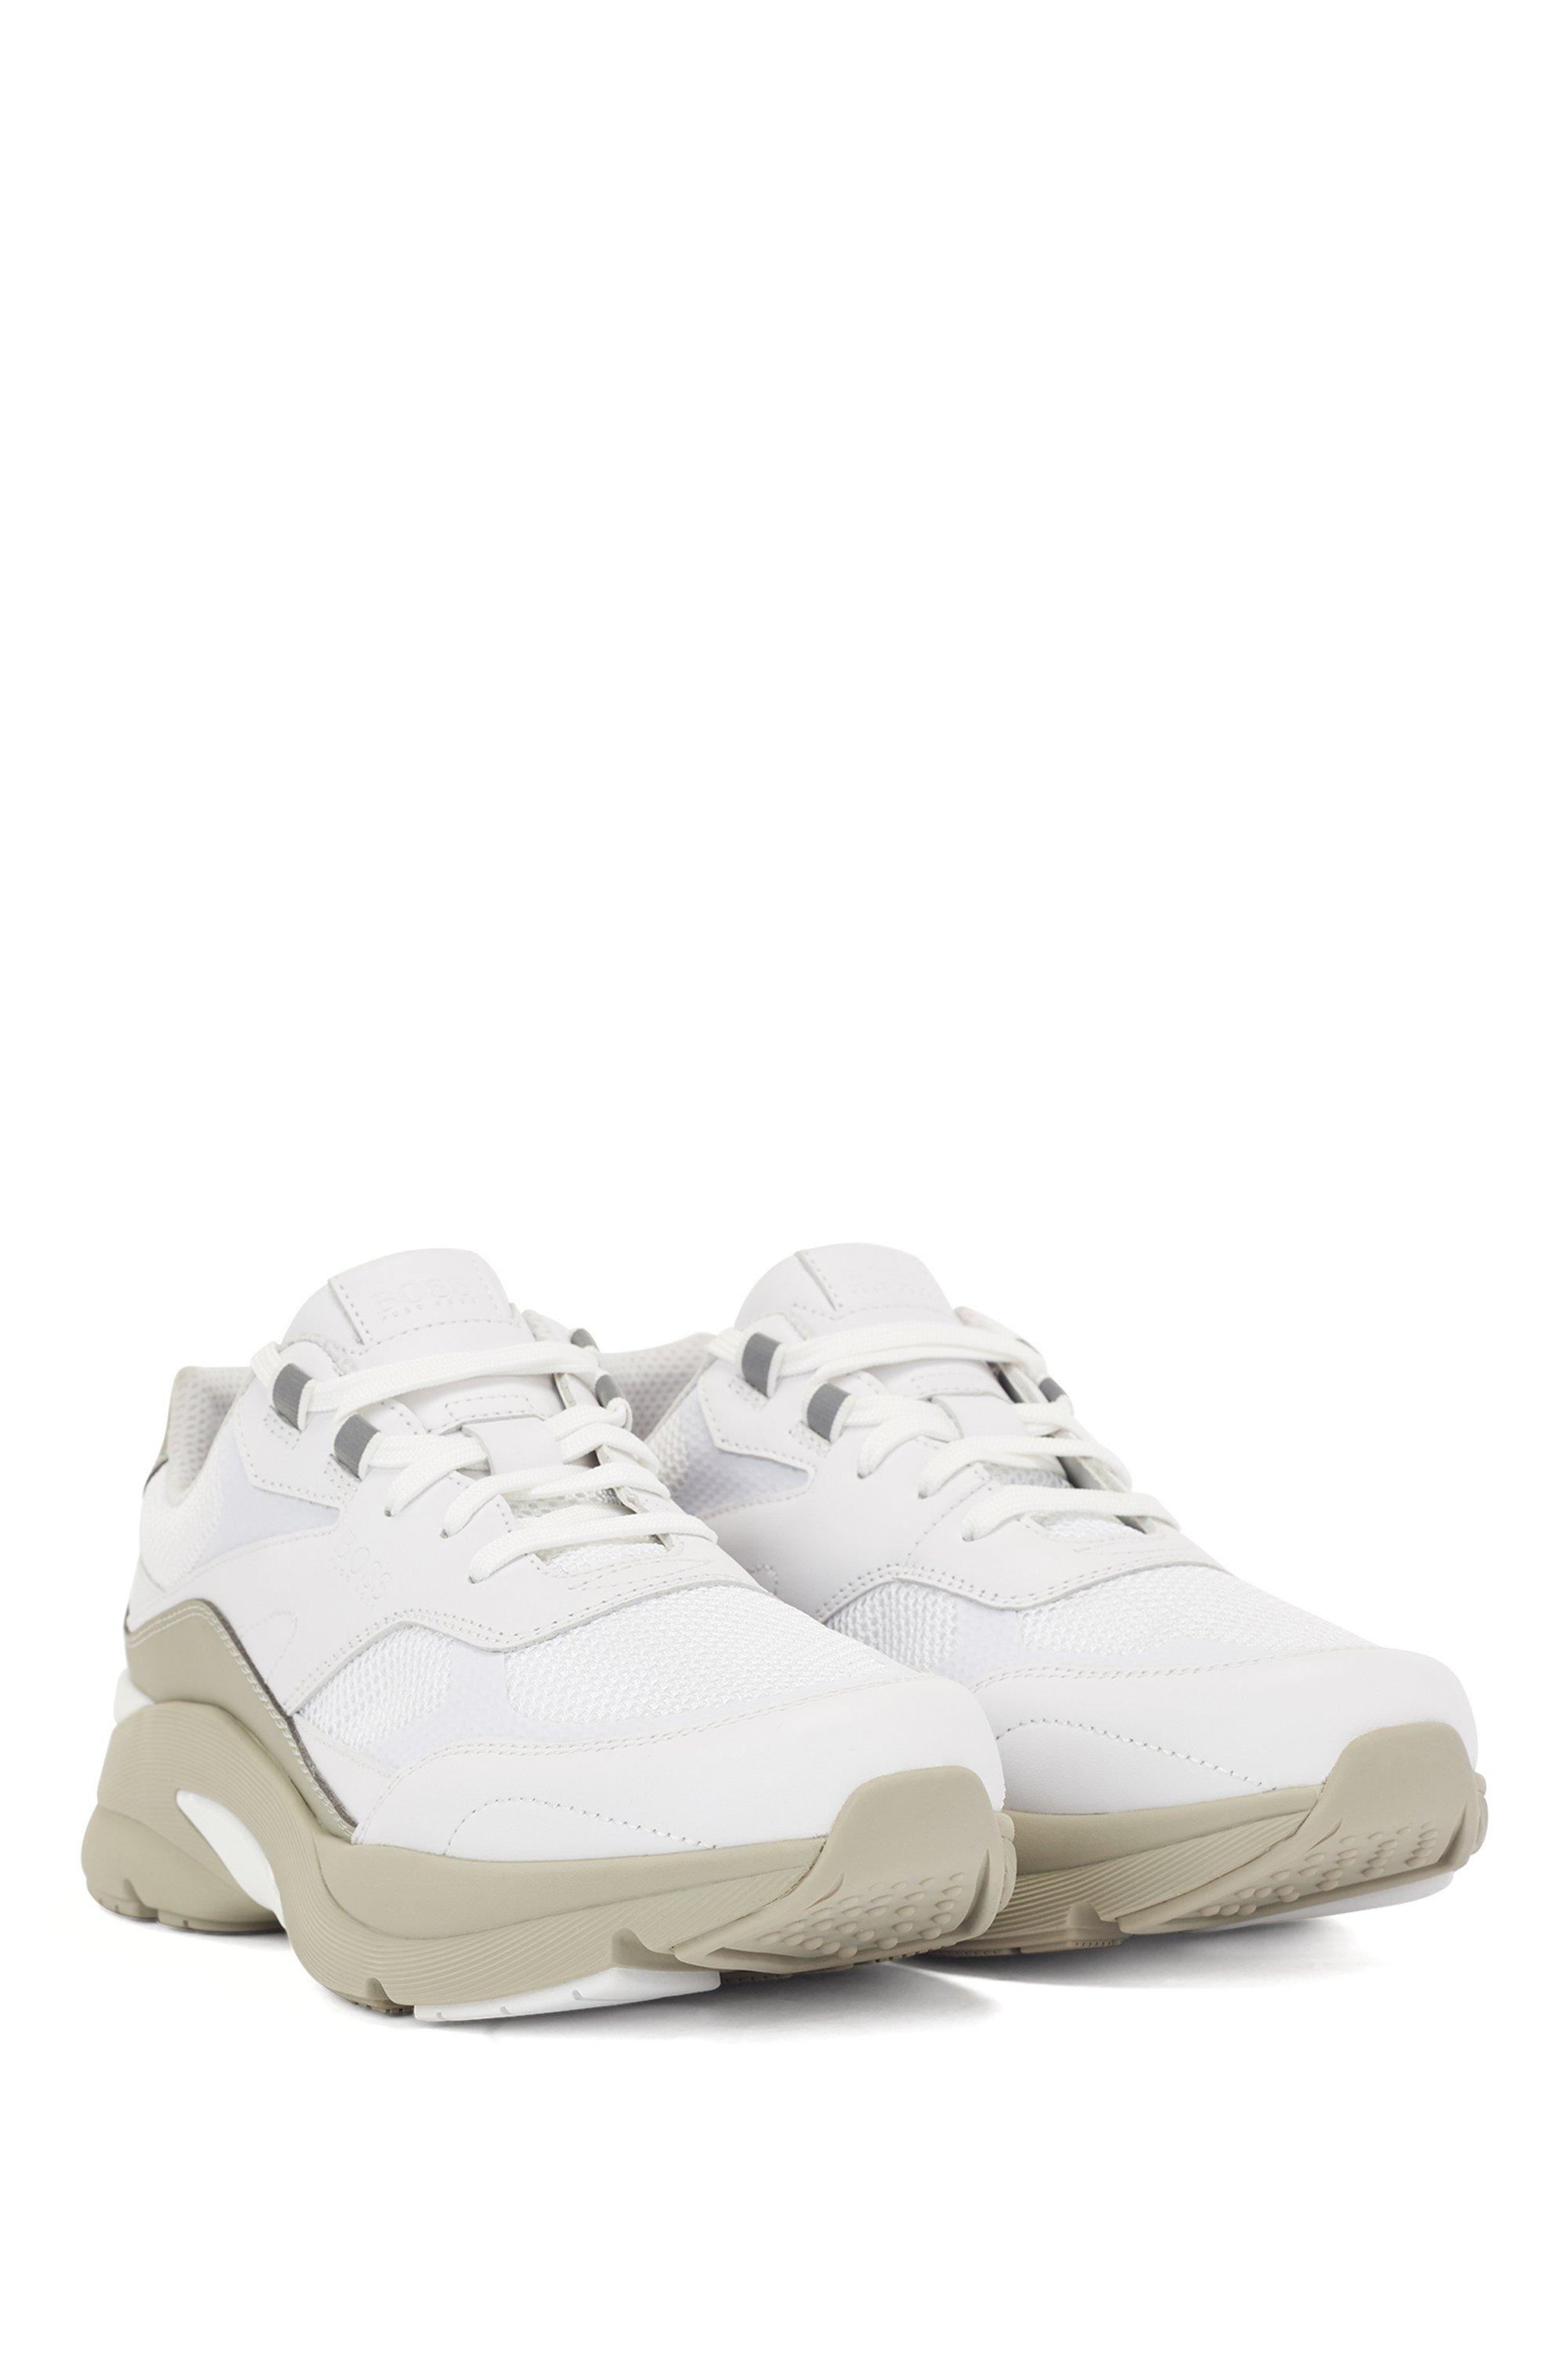 Sneakers stile running in pelle scamosciata e rete aperta